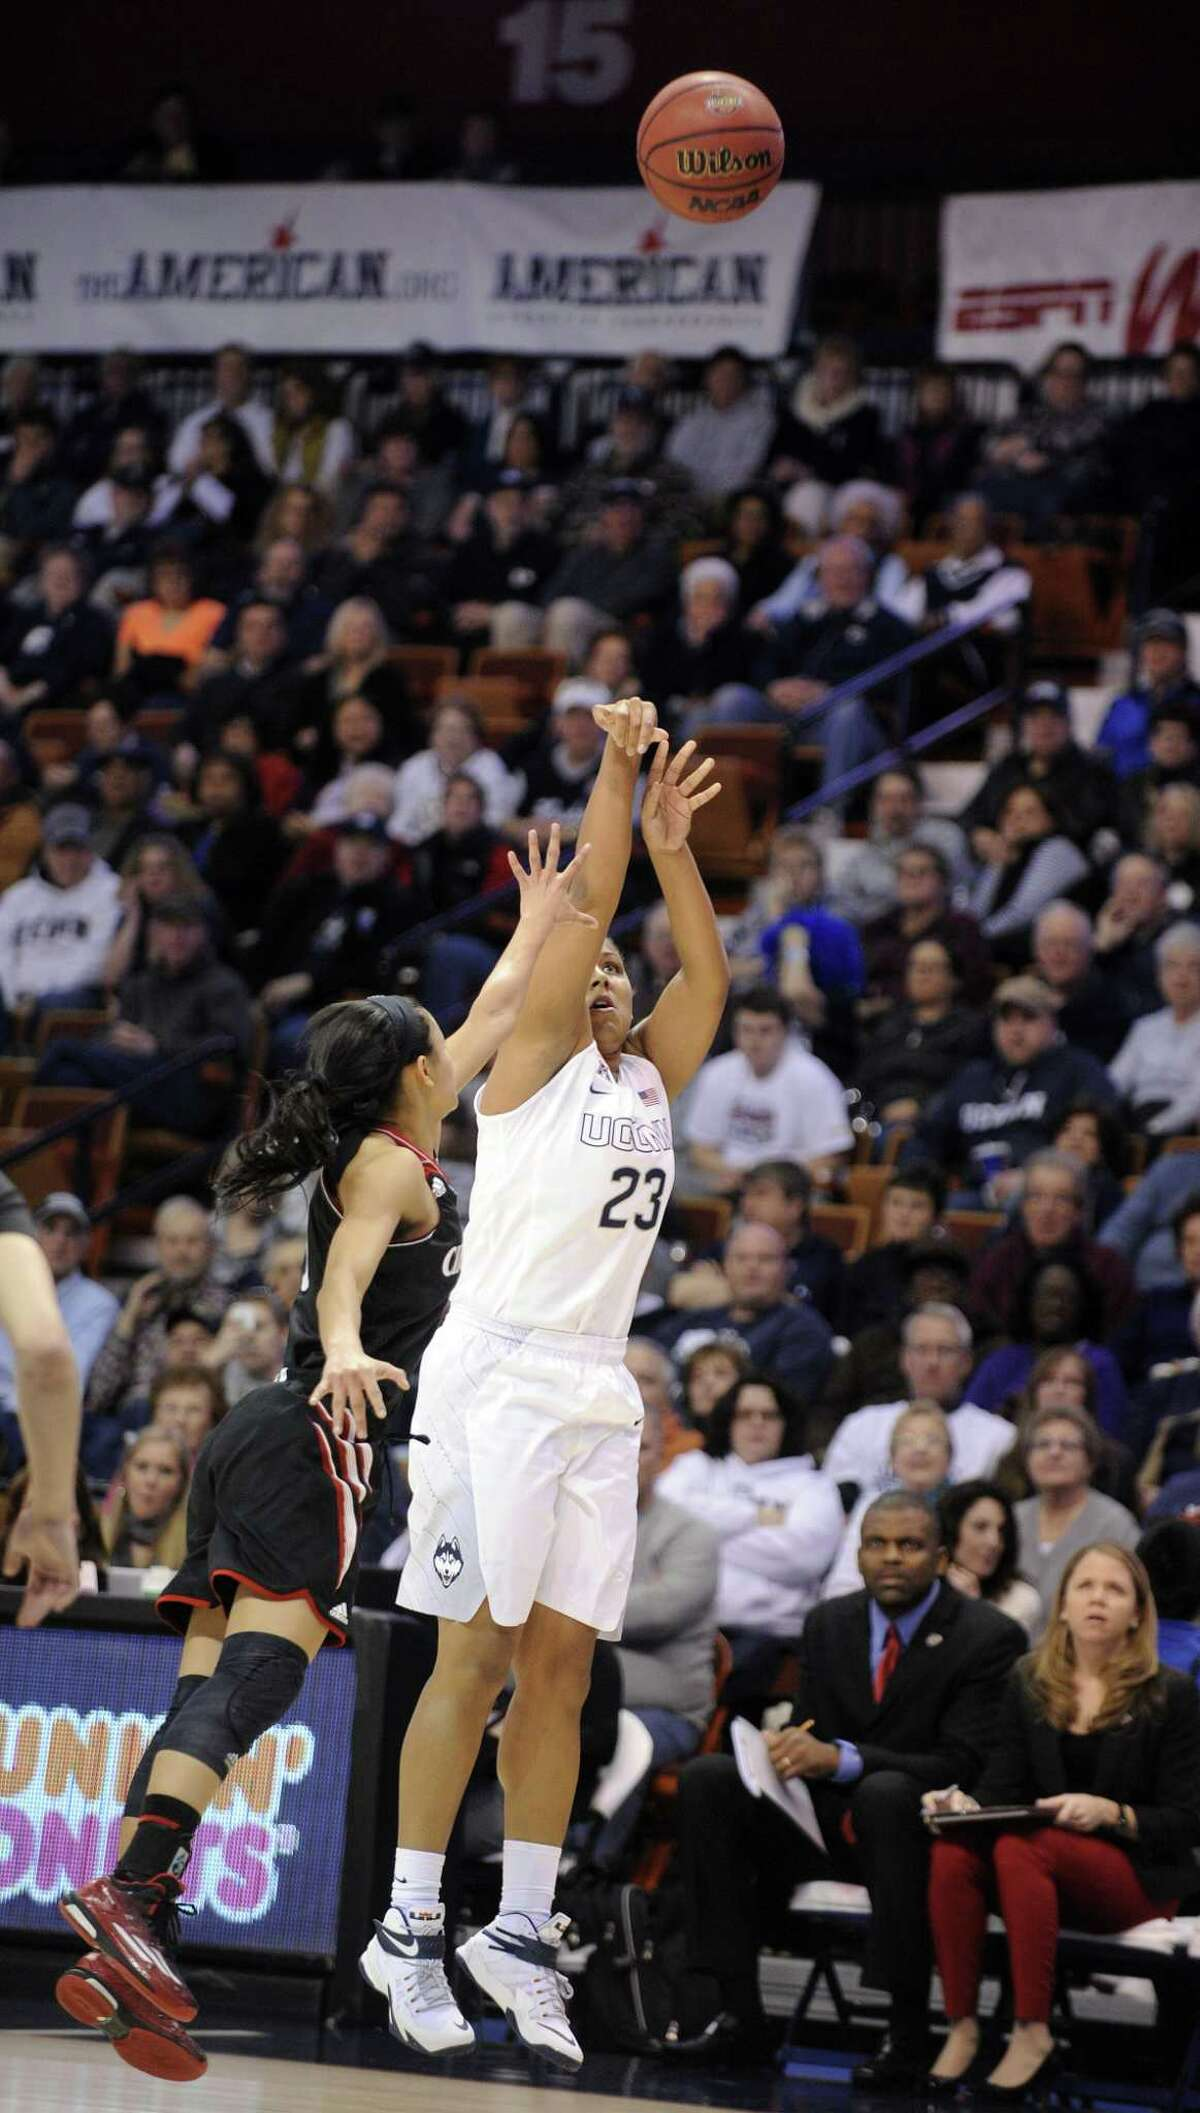 UConn's Kaleena Mosqueda-Lewis shoots over Cincinnati's Ana Owens (3) during the Huskies' 93-34 win in the quarterfinals of the AAC tournament Saturday in Uncasville.